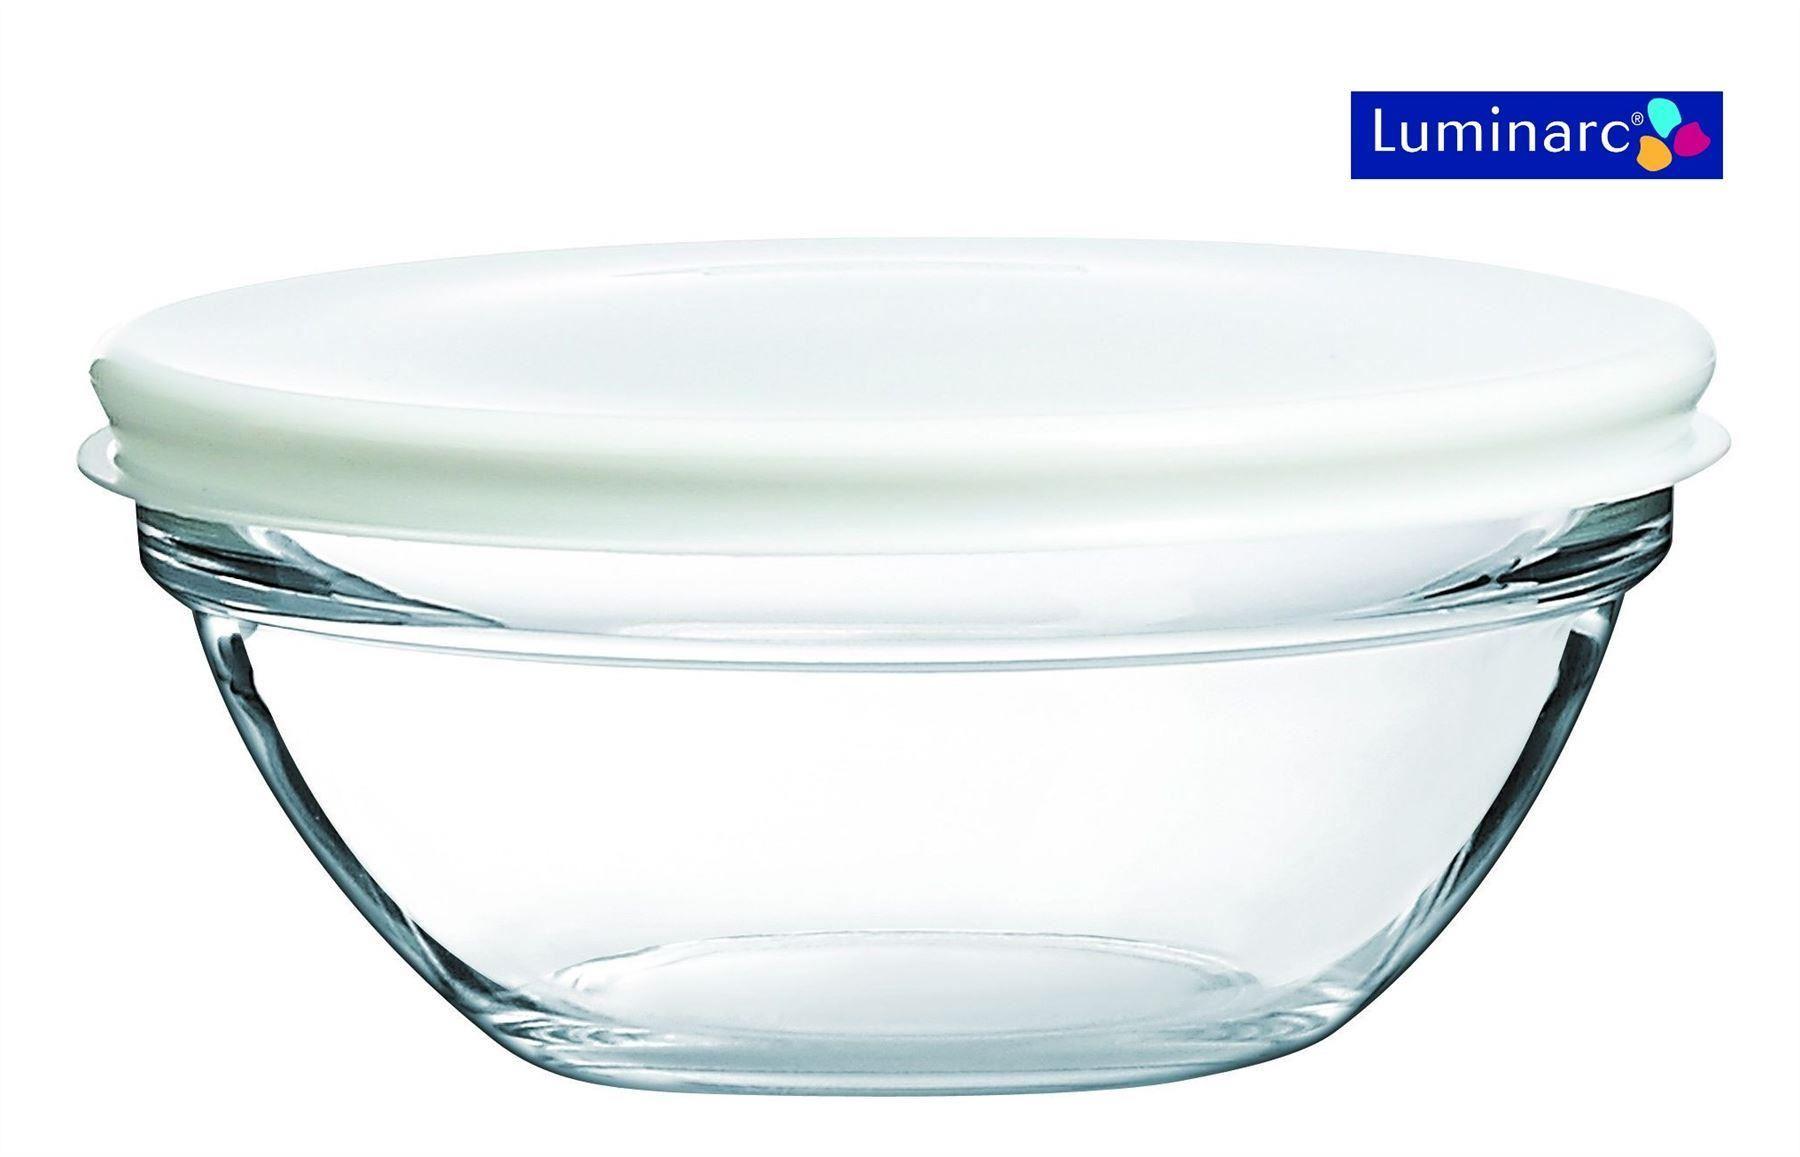 Luminarc-Glass-Stacking-Storage-Bowls-Containers-with-Lid-  sc 1 st  eBay & Luminarc Glass Stacking Storage Bowls Containers with Lid 121417 ...